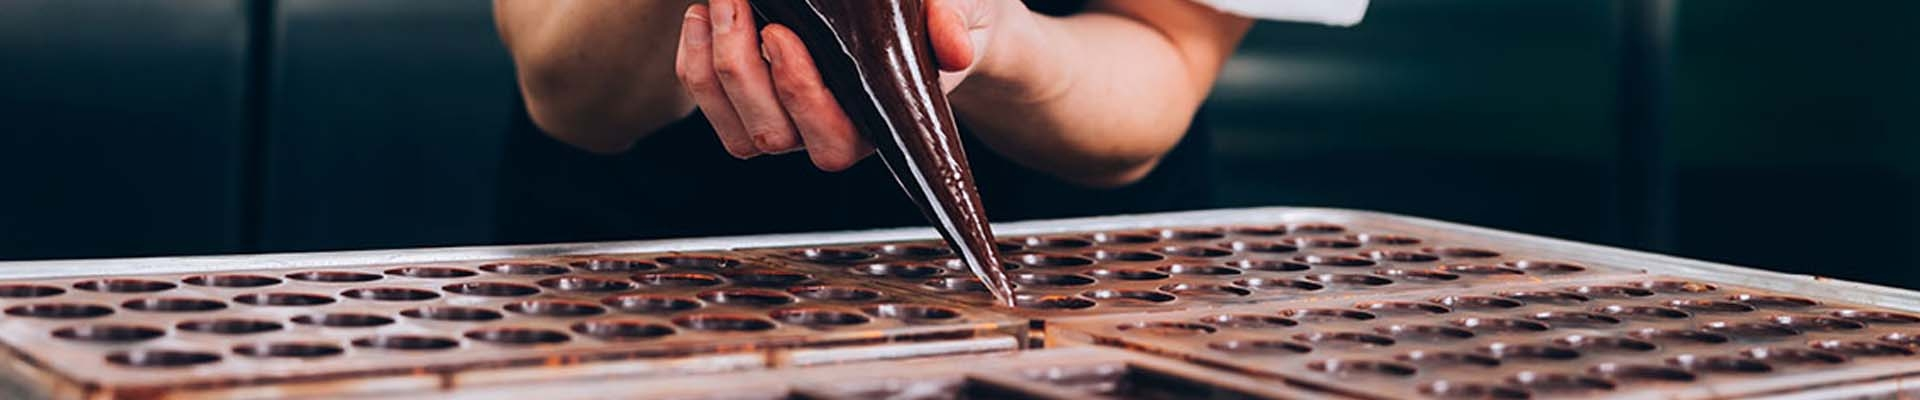 Private label chocolade